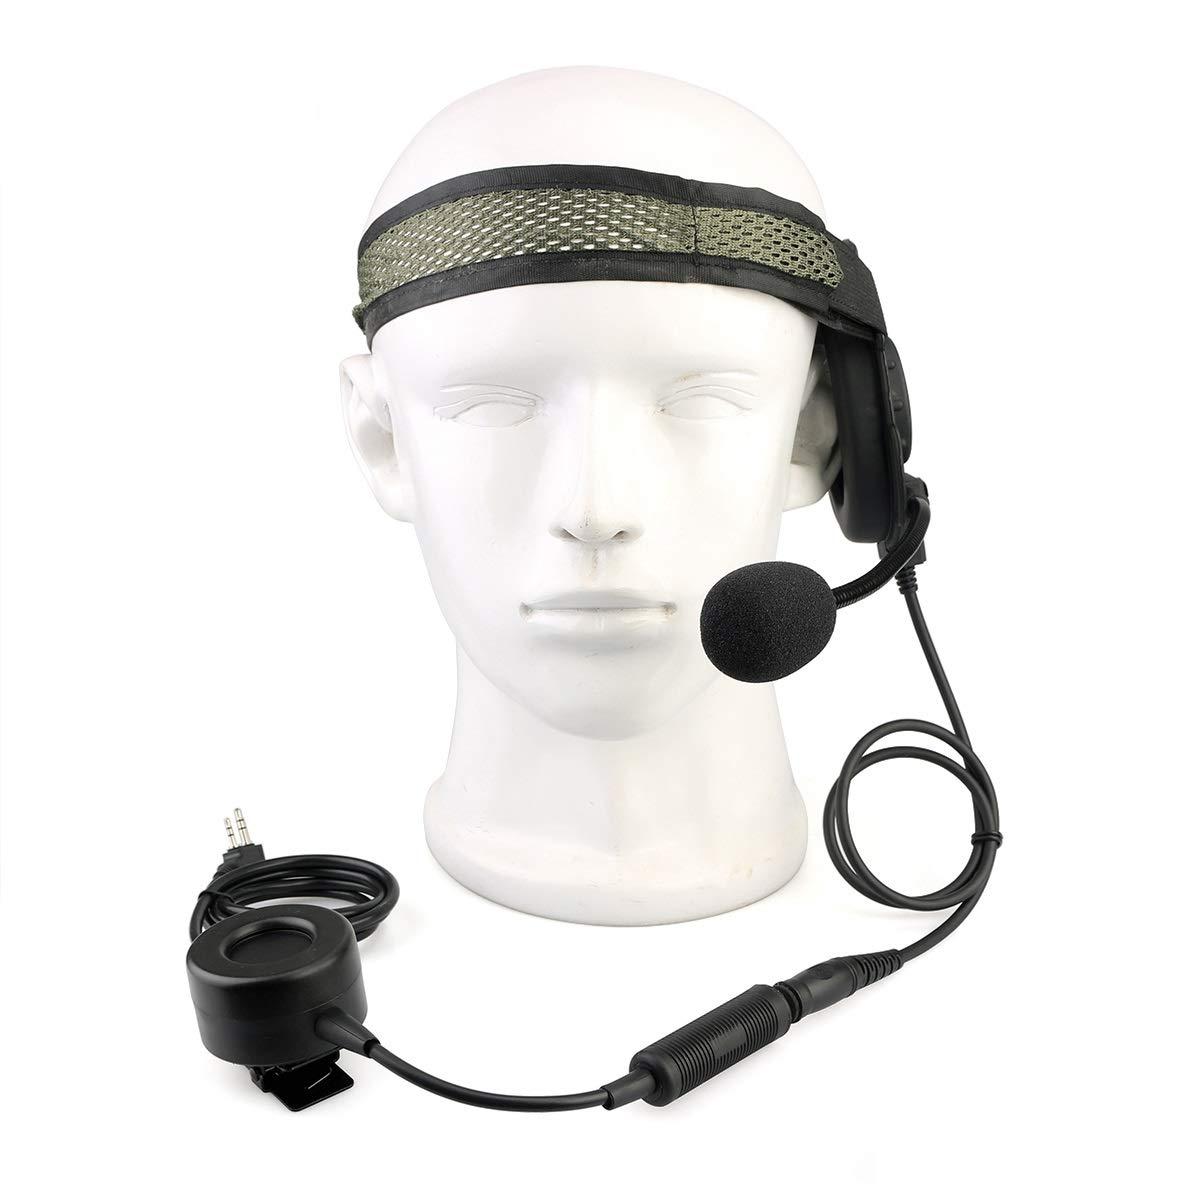 Amazon.com: Retevis EH060K 2 Way Radio Headset Tactical ...